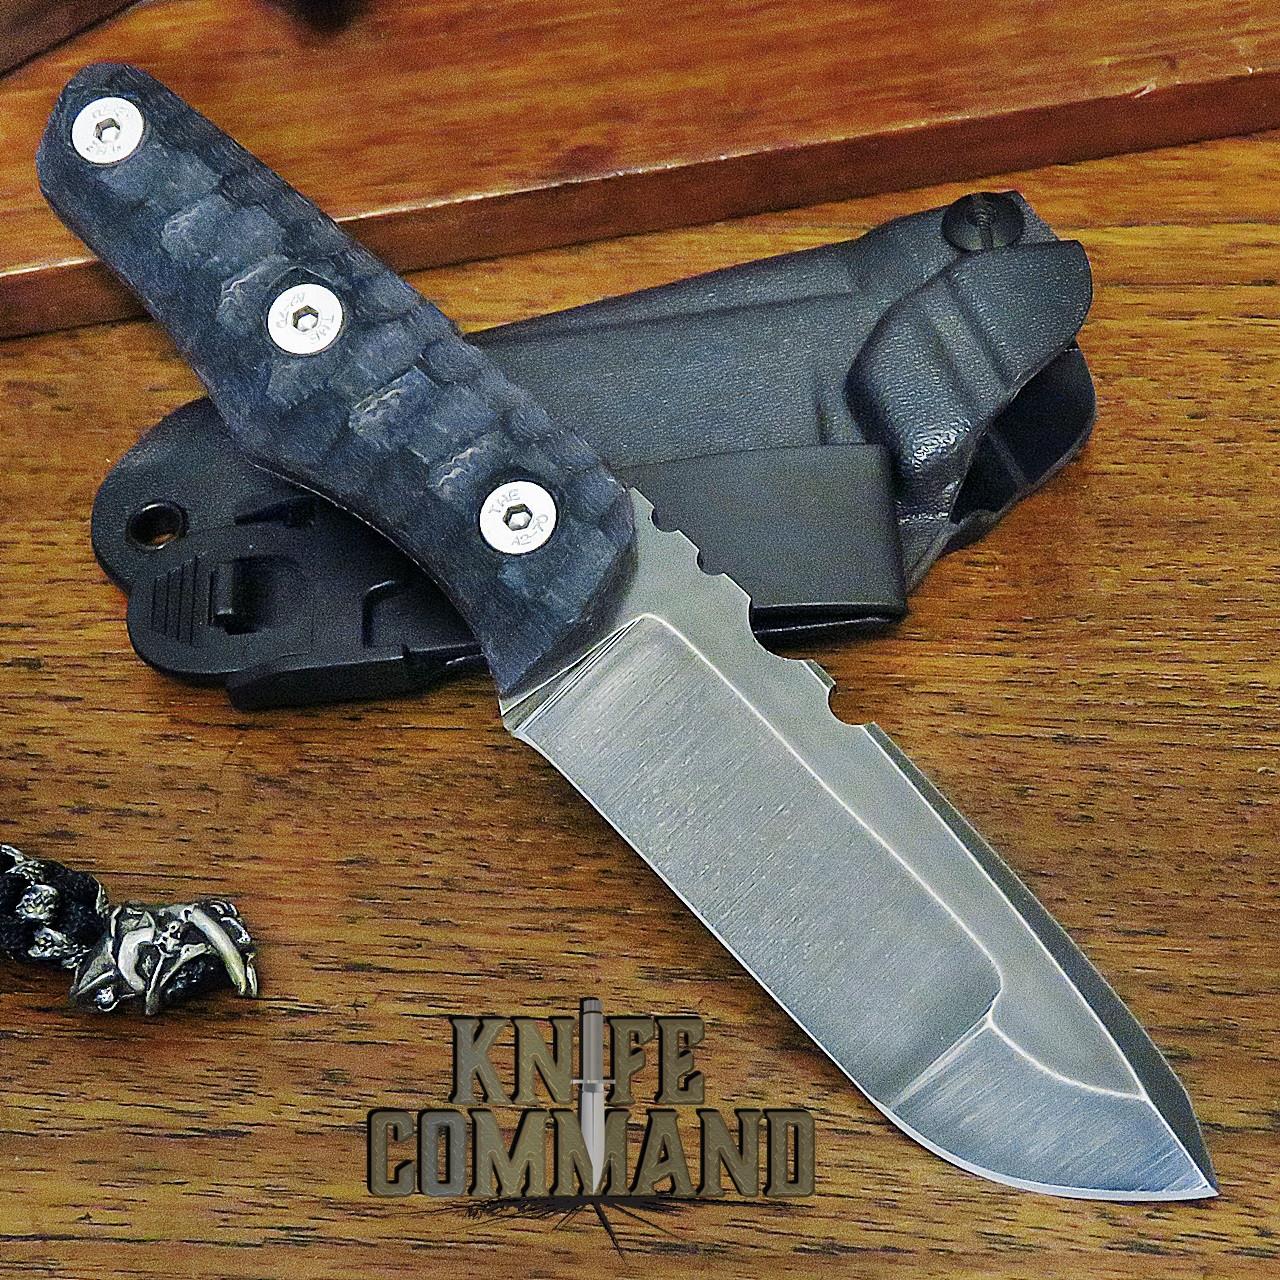 Wander Tactical Custom Scrambler EDC Fixed Blade Knife Compound Blade Dark Violet Micarta